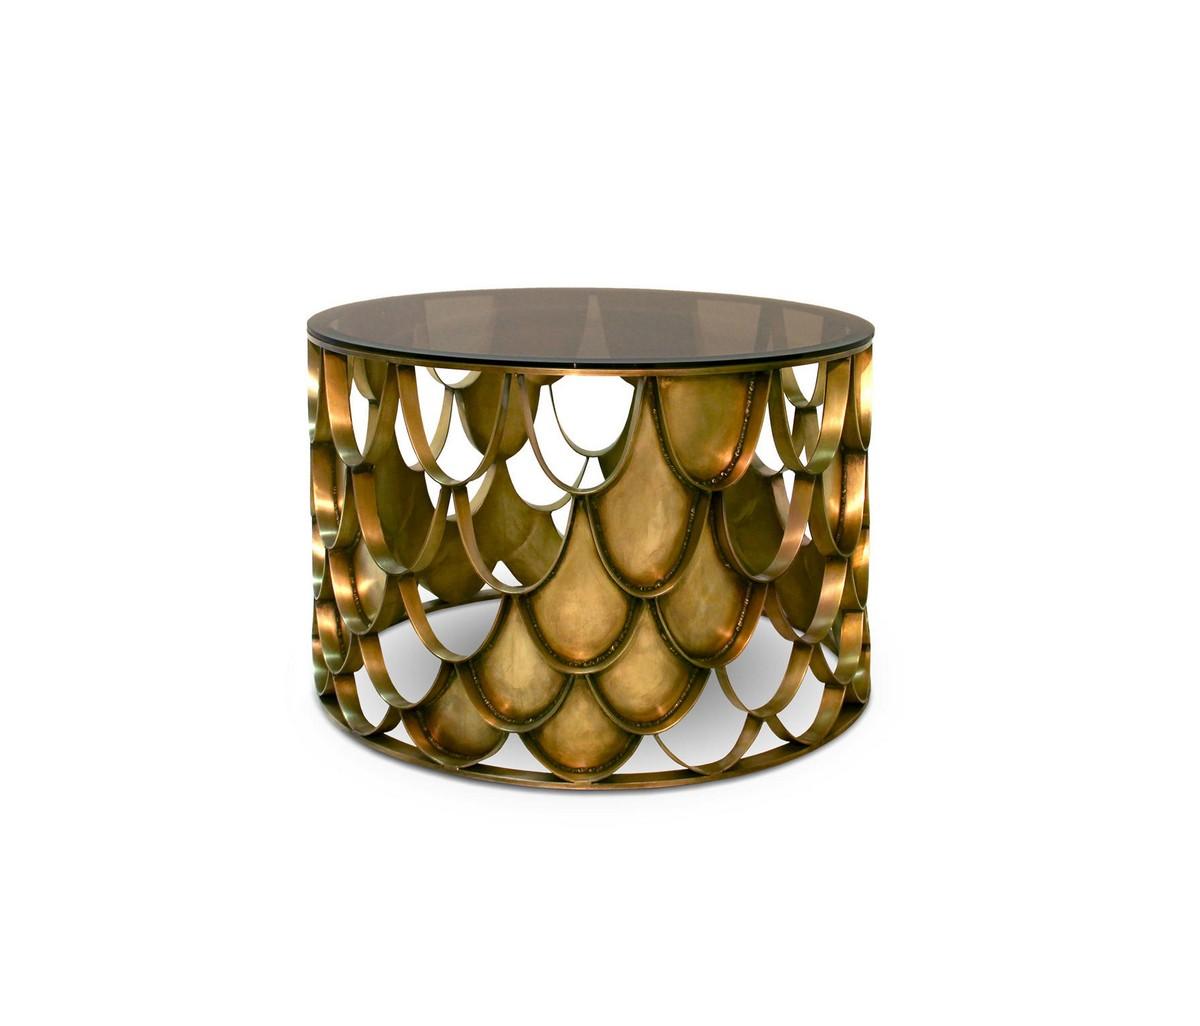 Koi Center Table – Craftsmanship Meets Modern Design koi center table Koi Center Table – Craftsmanship Meets Modern Design koi center table b